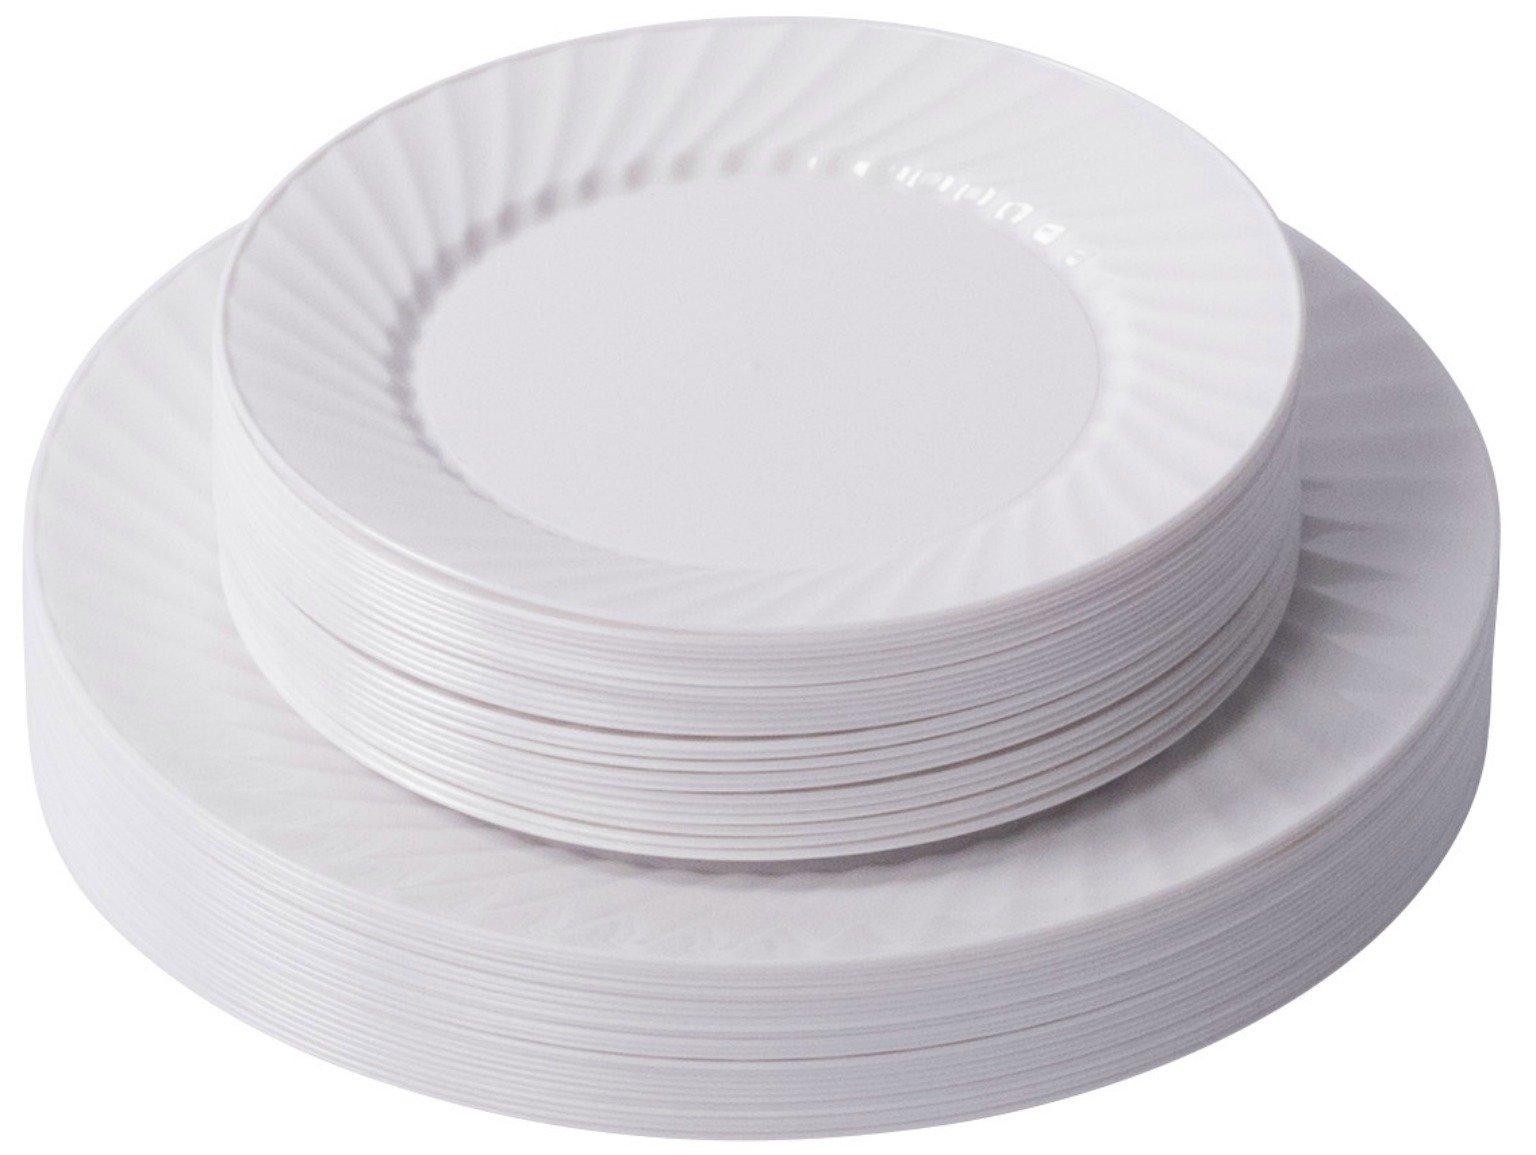 Zy 100 6 Inch Plastic Dessert Plates Premium Quality Heavyweight Disposable Hard